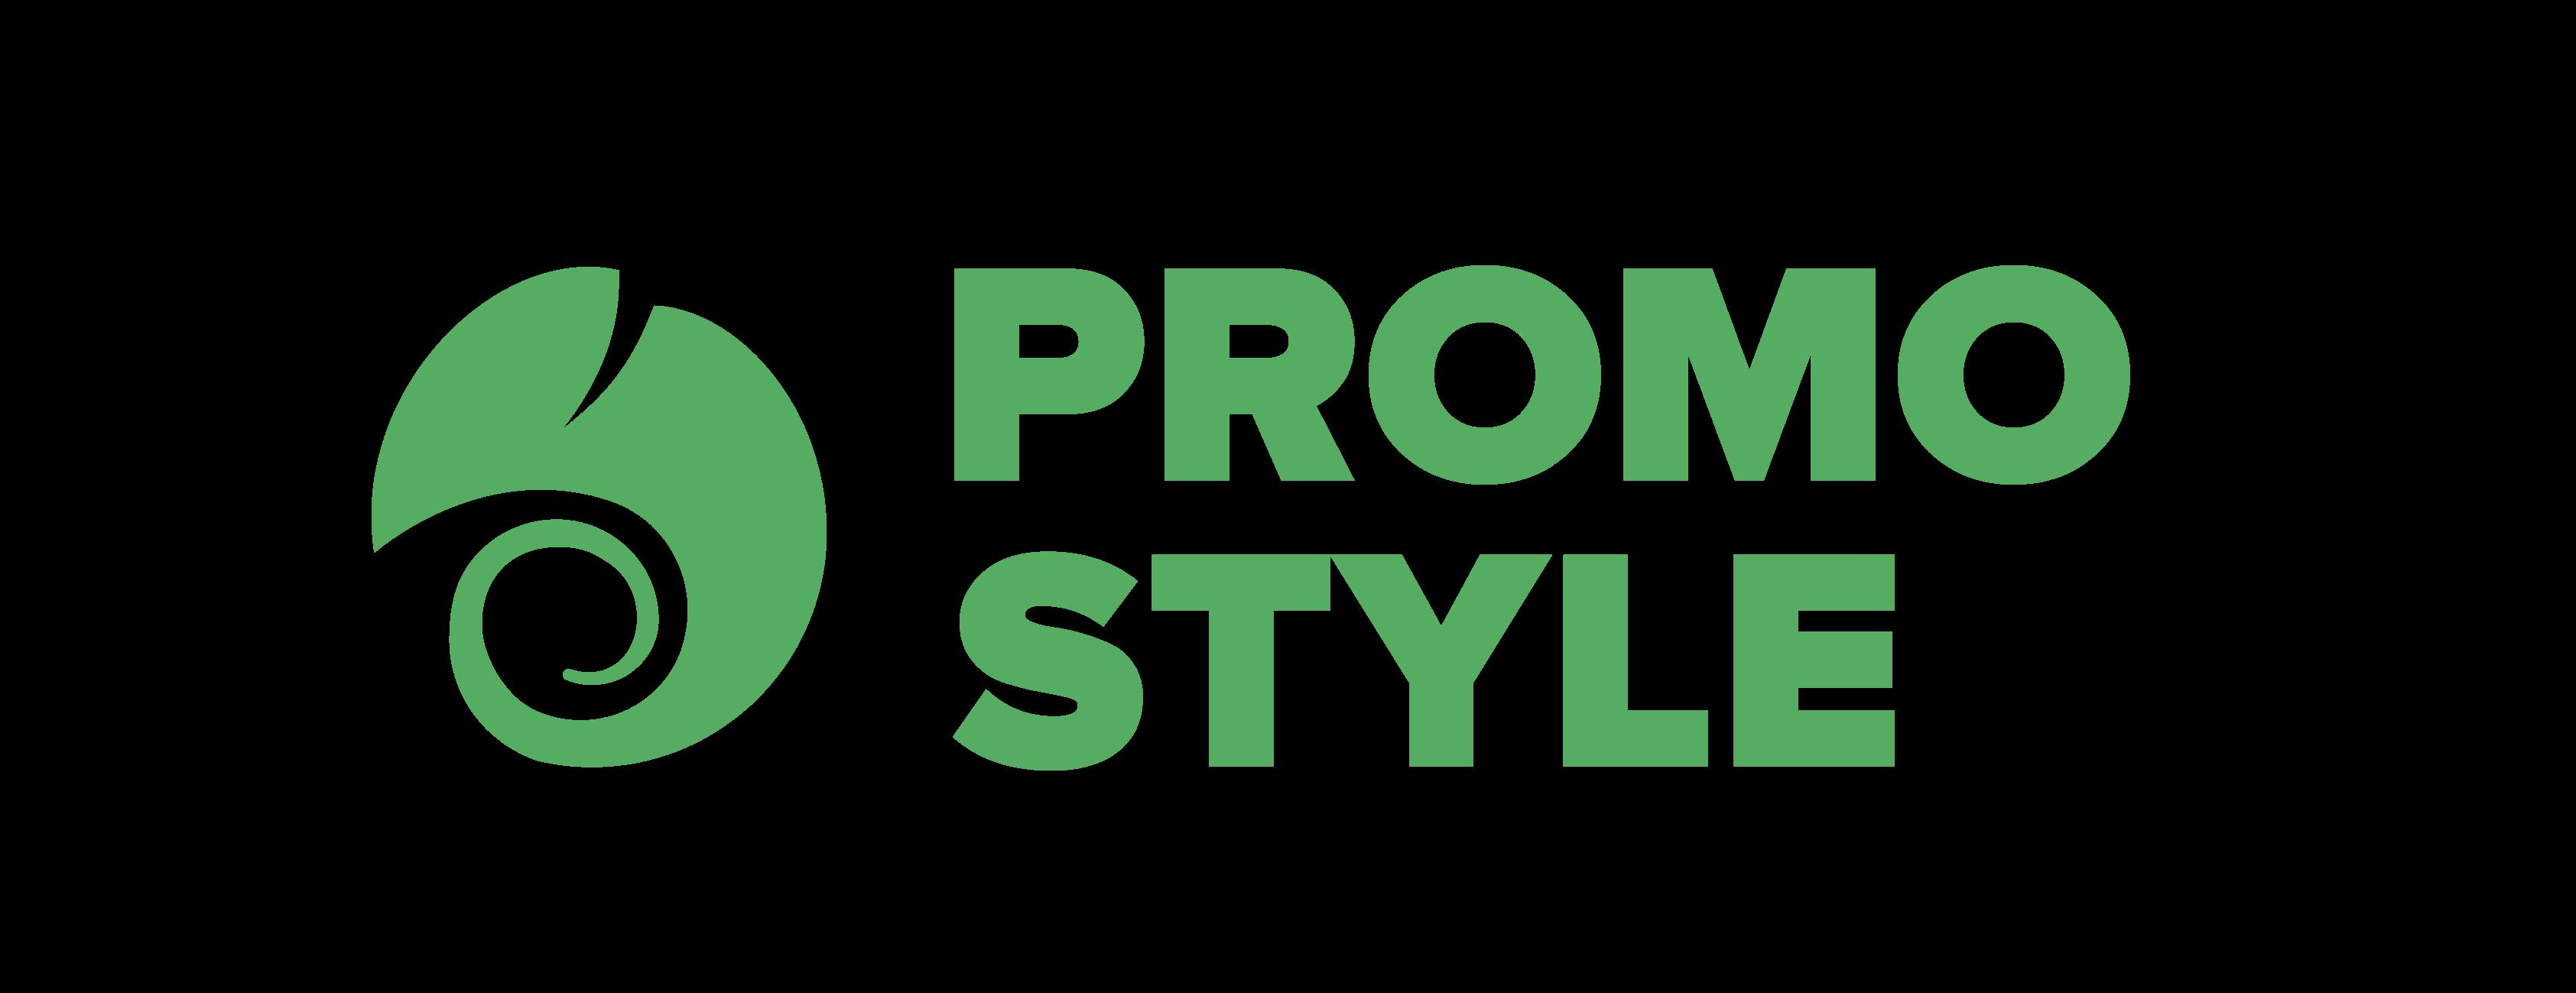 PROMOSTYLE